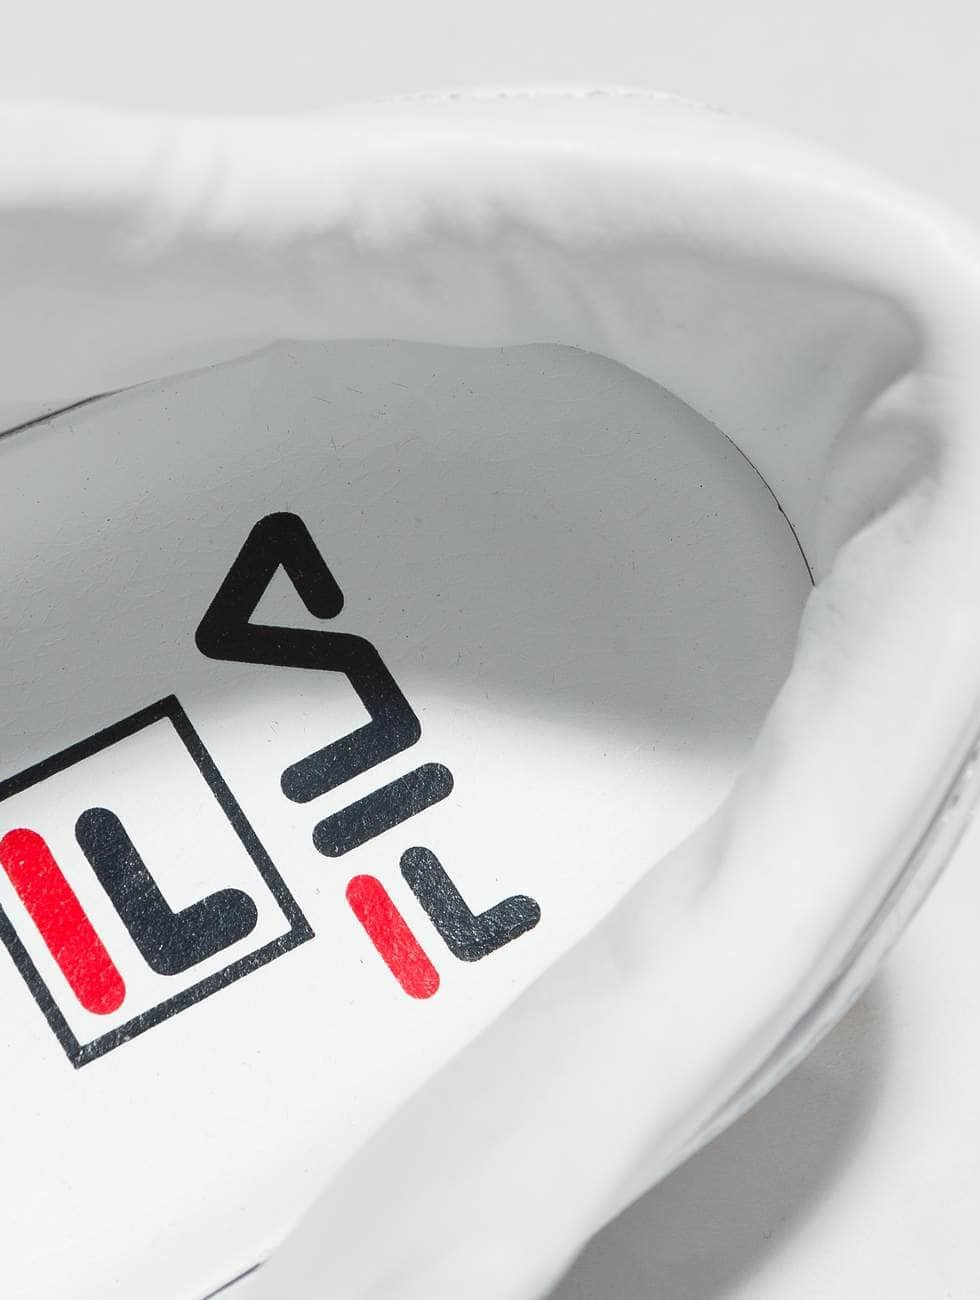 Hoge Kwaliteit Goedkope Kopen Goedkope Goede Verkoop FILA schoen / sneaker Heritage T1 in wit 485510 Hoeveel Te Koop koel In Nederland Goedkope Prijs oMNAE3zC6X